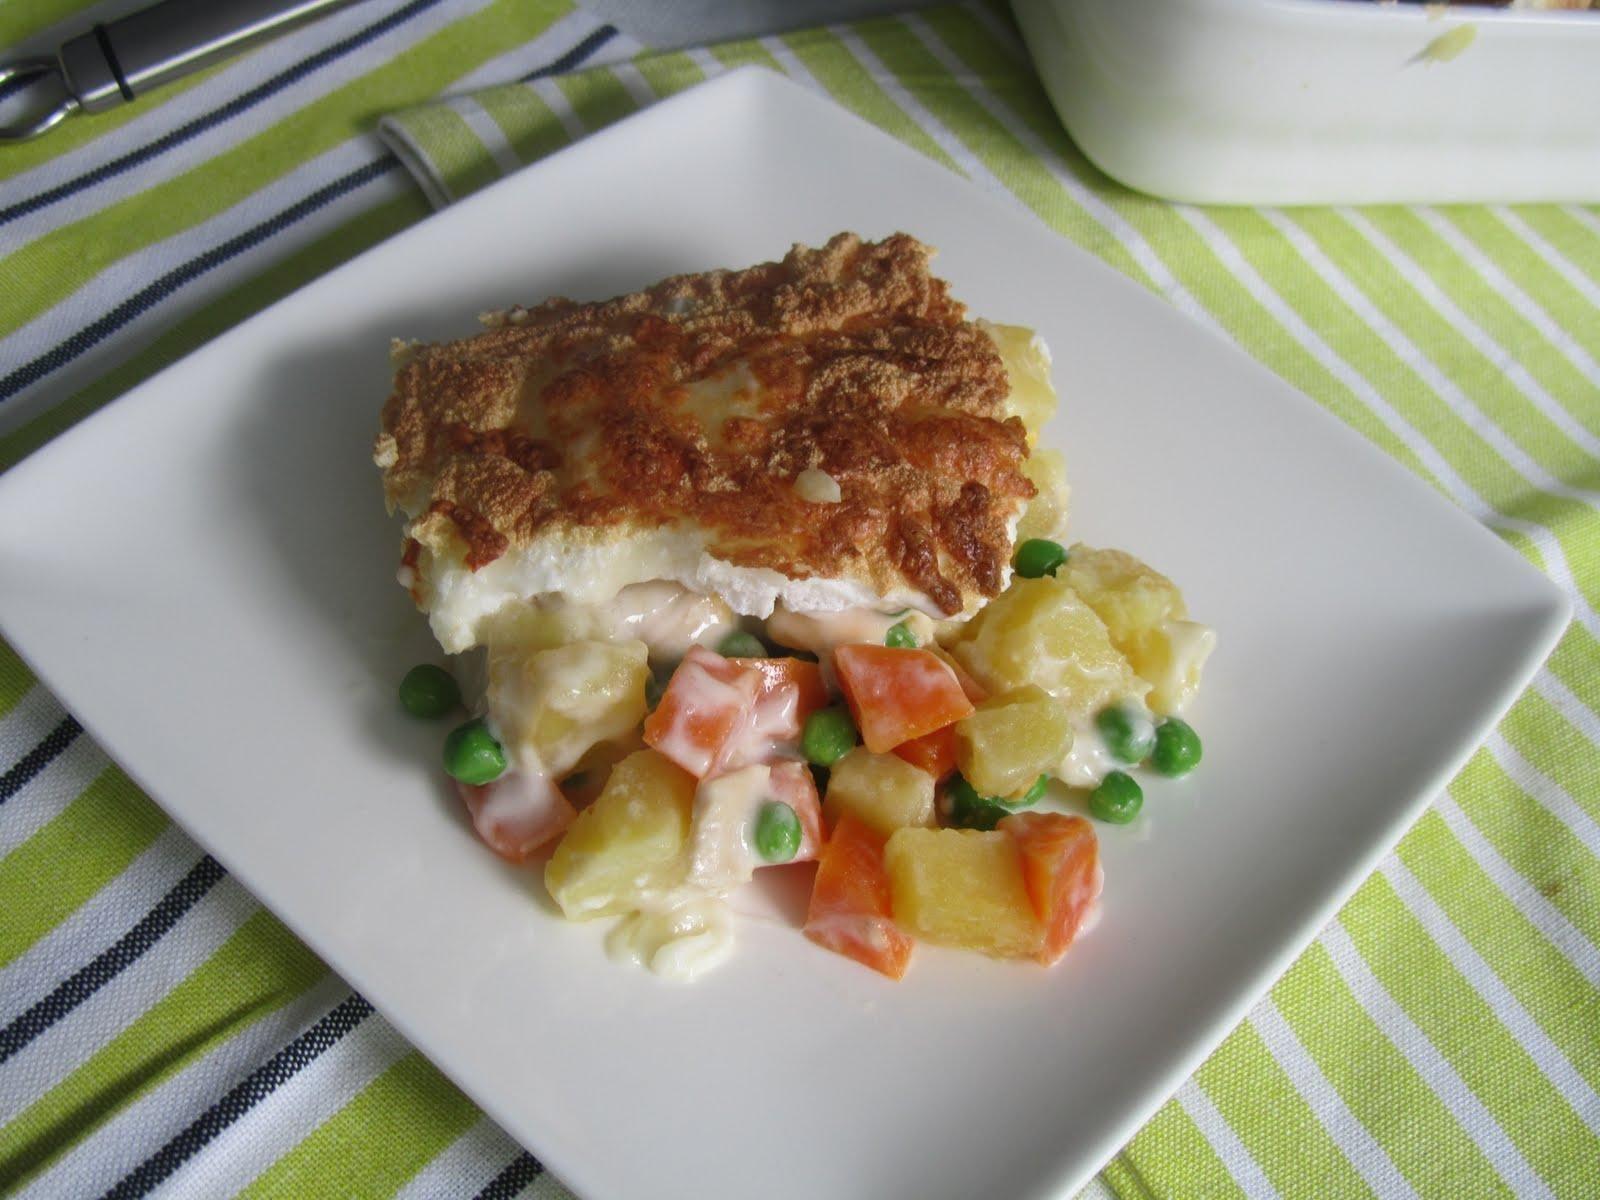 Chuleta de cerdo con ensalada rusa